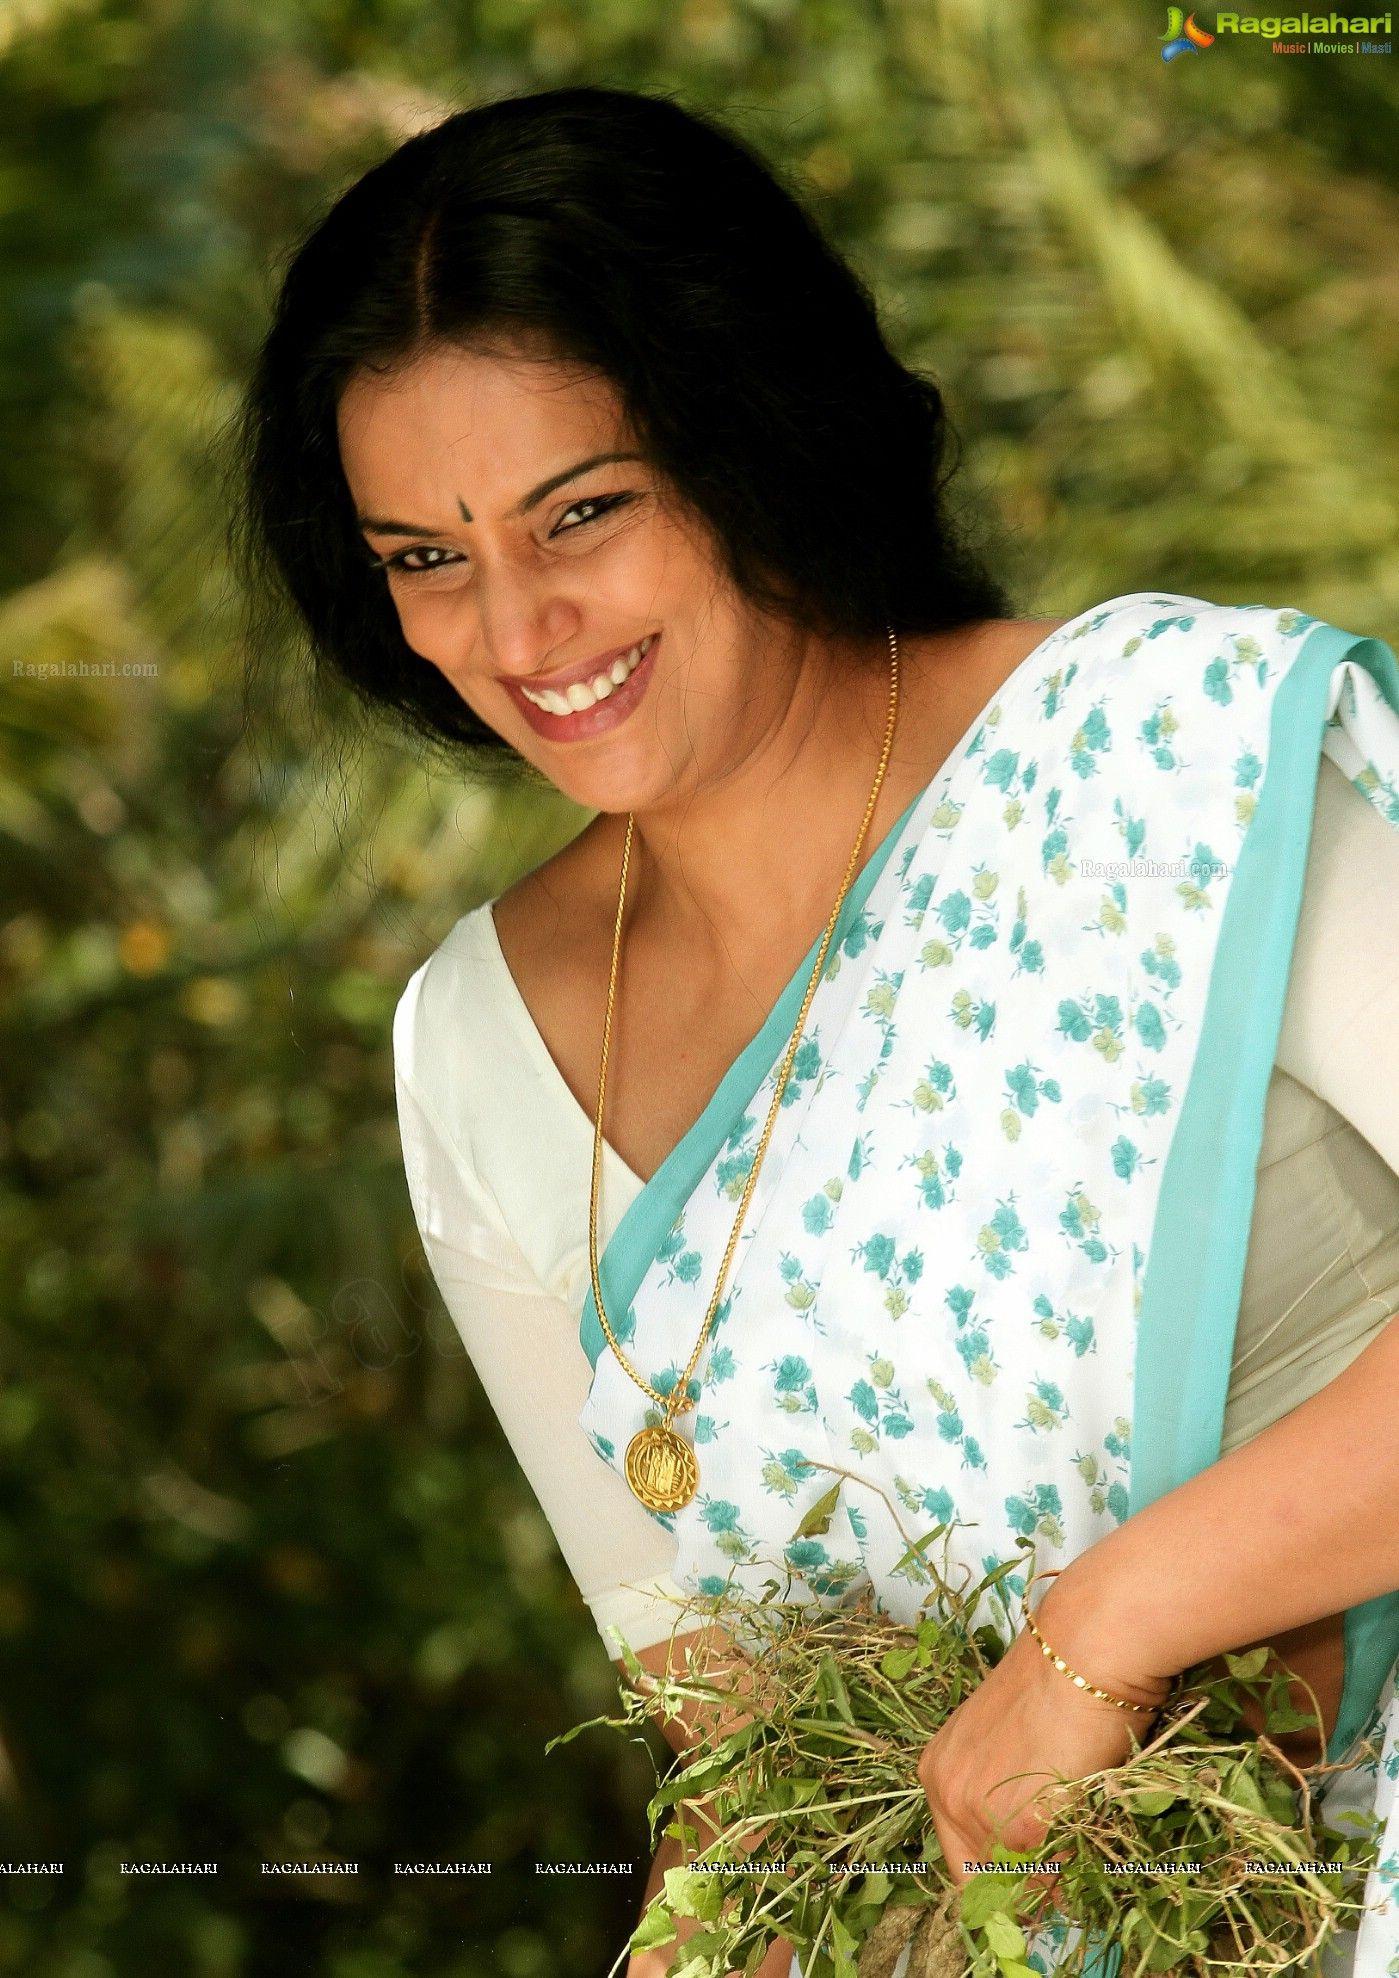 Pin by Raju Tarak on Swetha menon Shweta menon, Actress